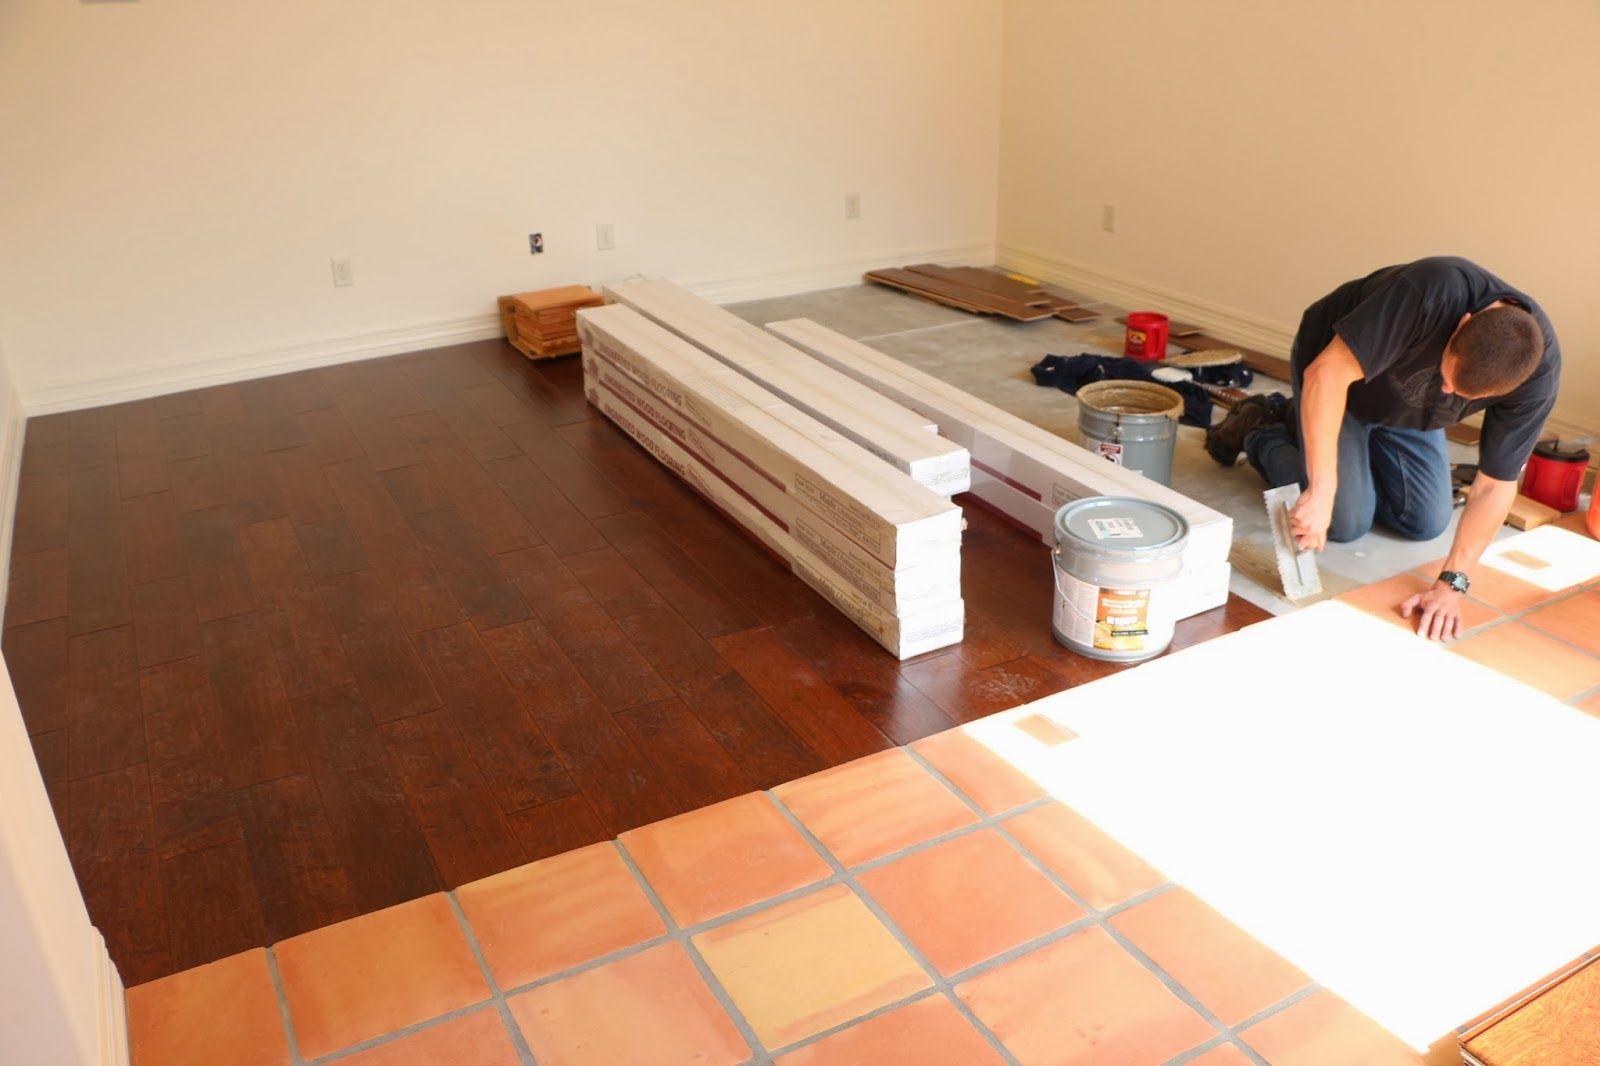 Dusty Coyote Kitchen Hood Driveway Pavers Wood Floor Wood Floors Flooring Kitchen Hoods